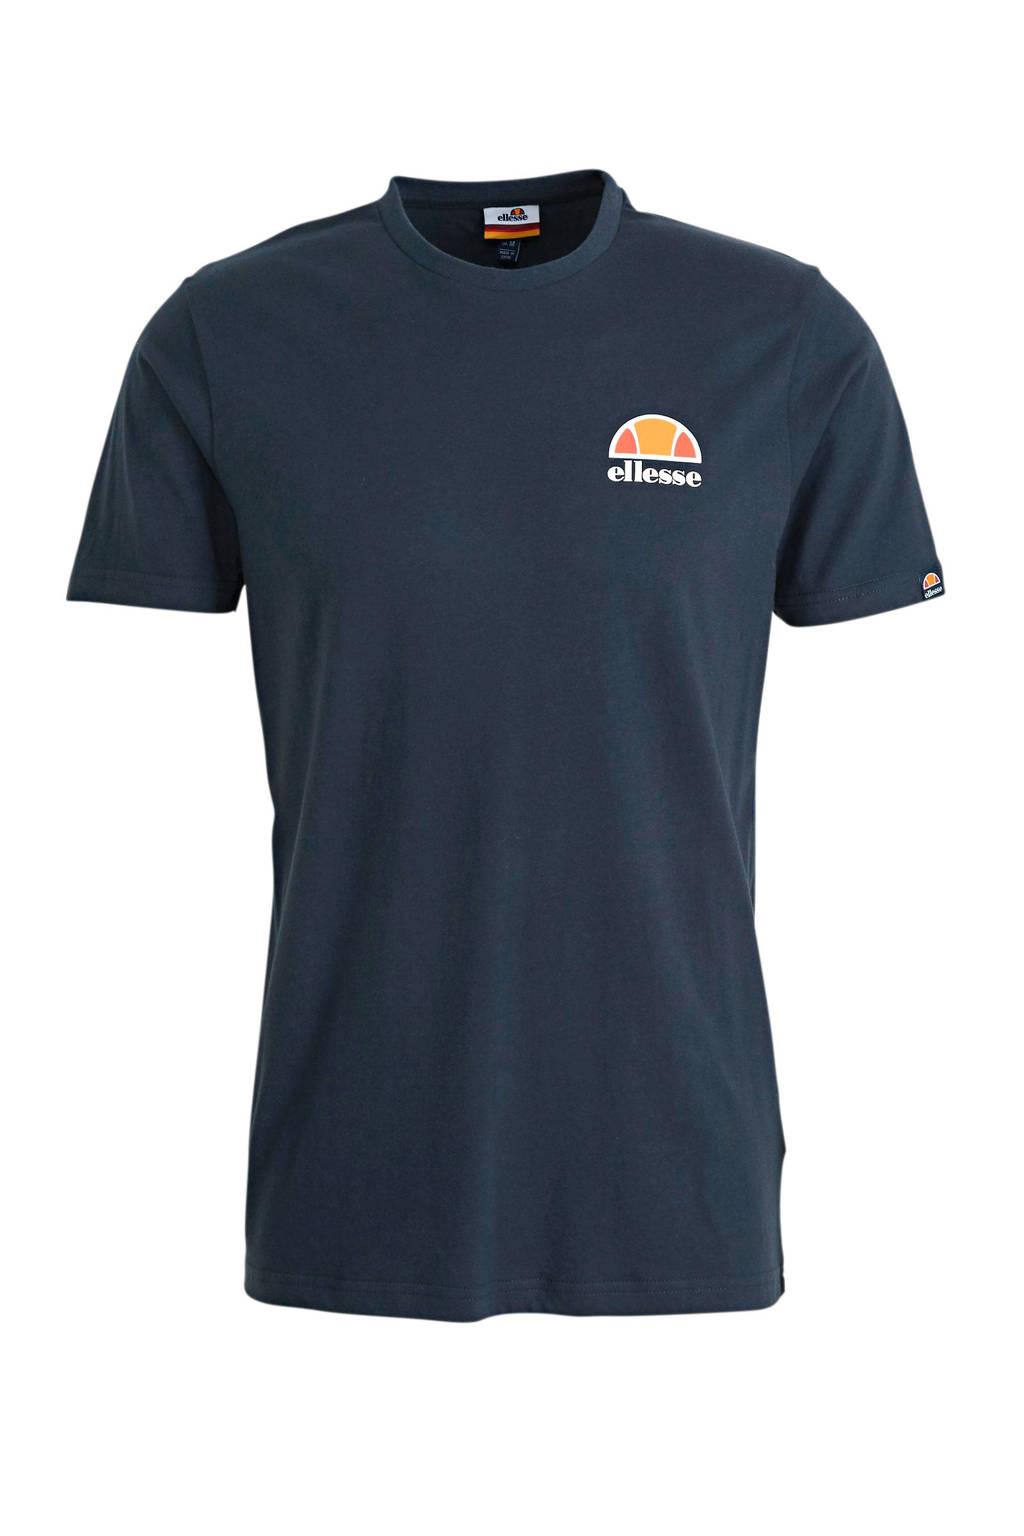 Ellesse T-shirt donkerblauw, Donkerblauw